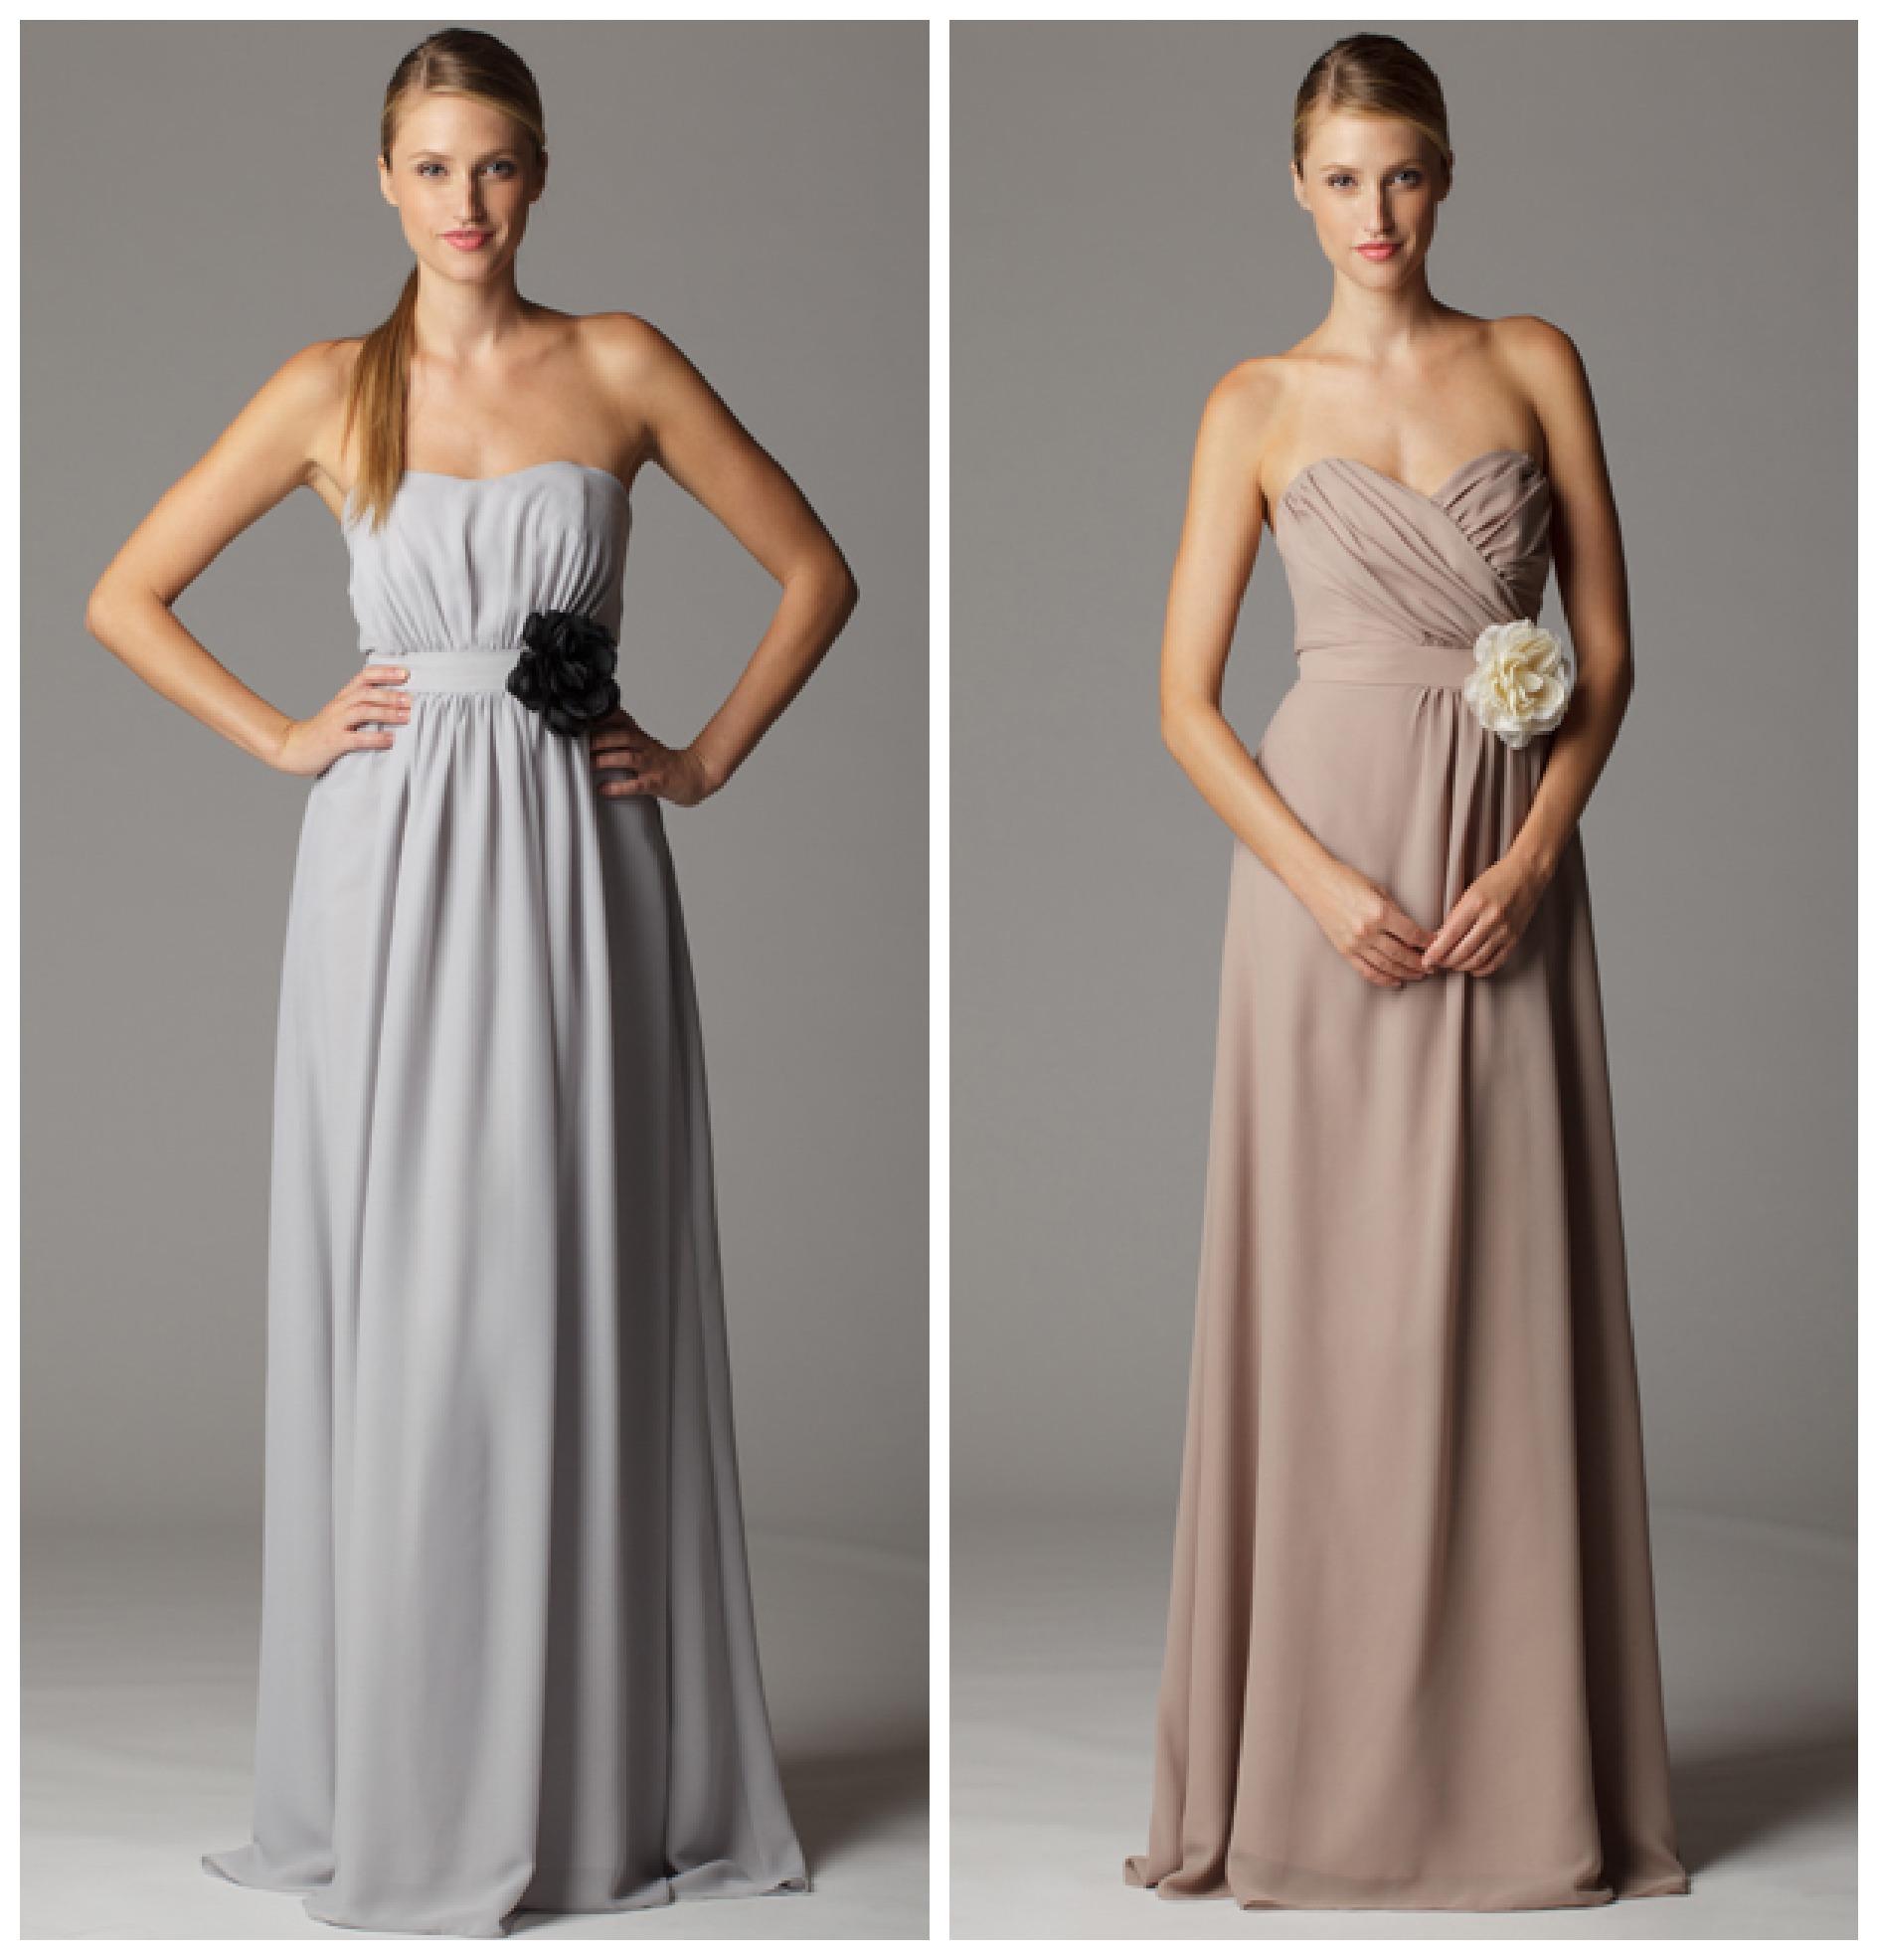 Soft & Flowy Bridesmaid Dresses